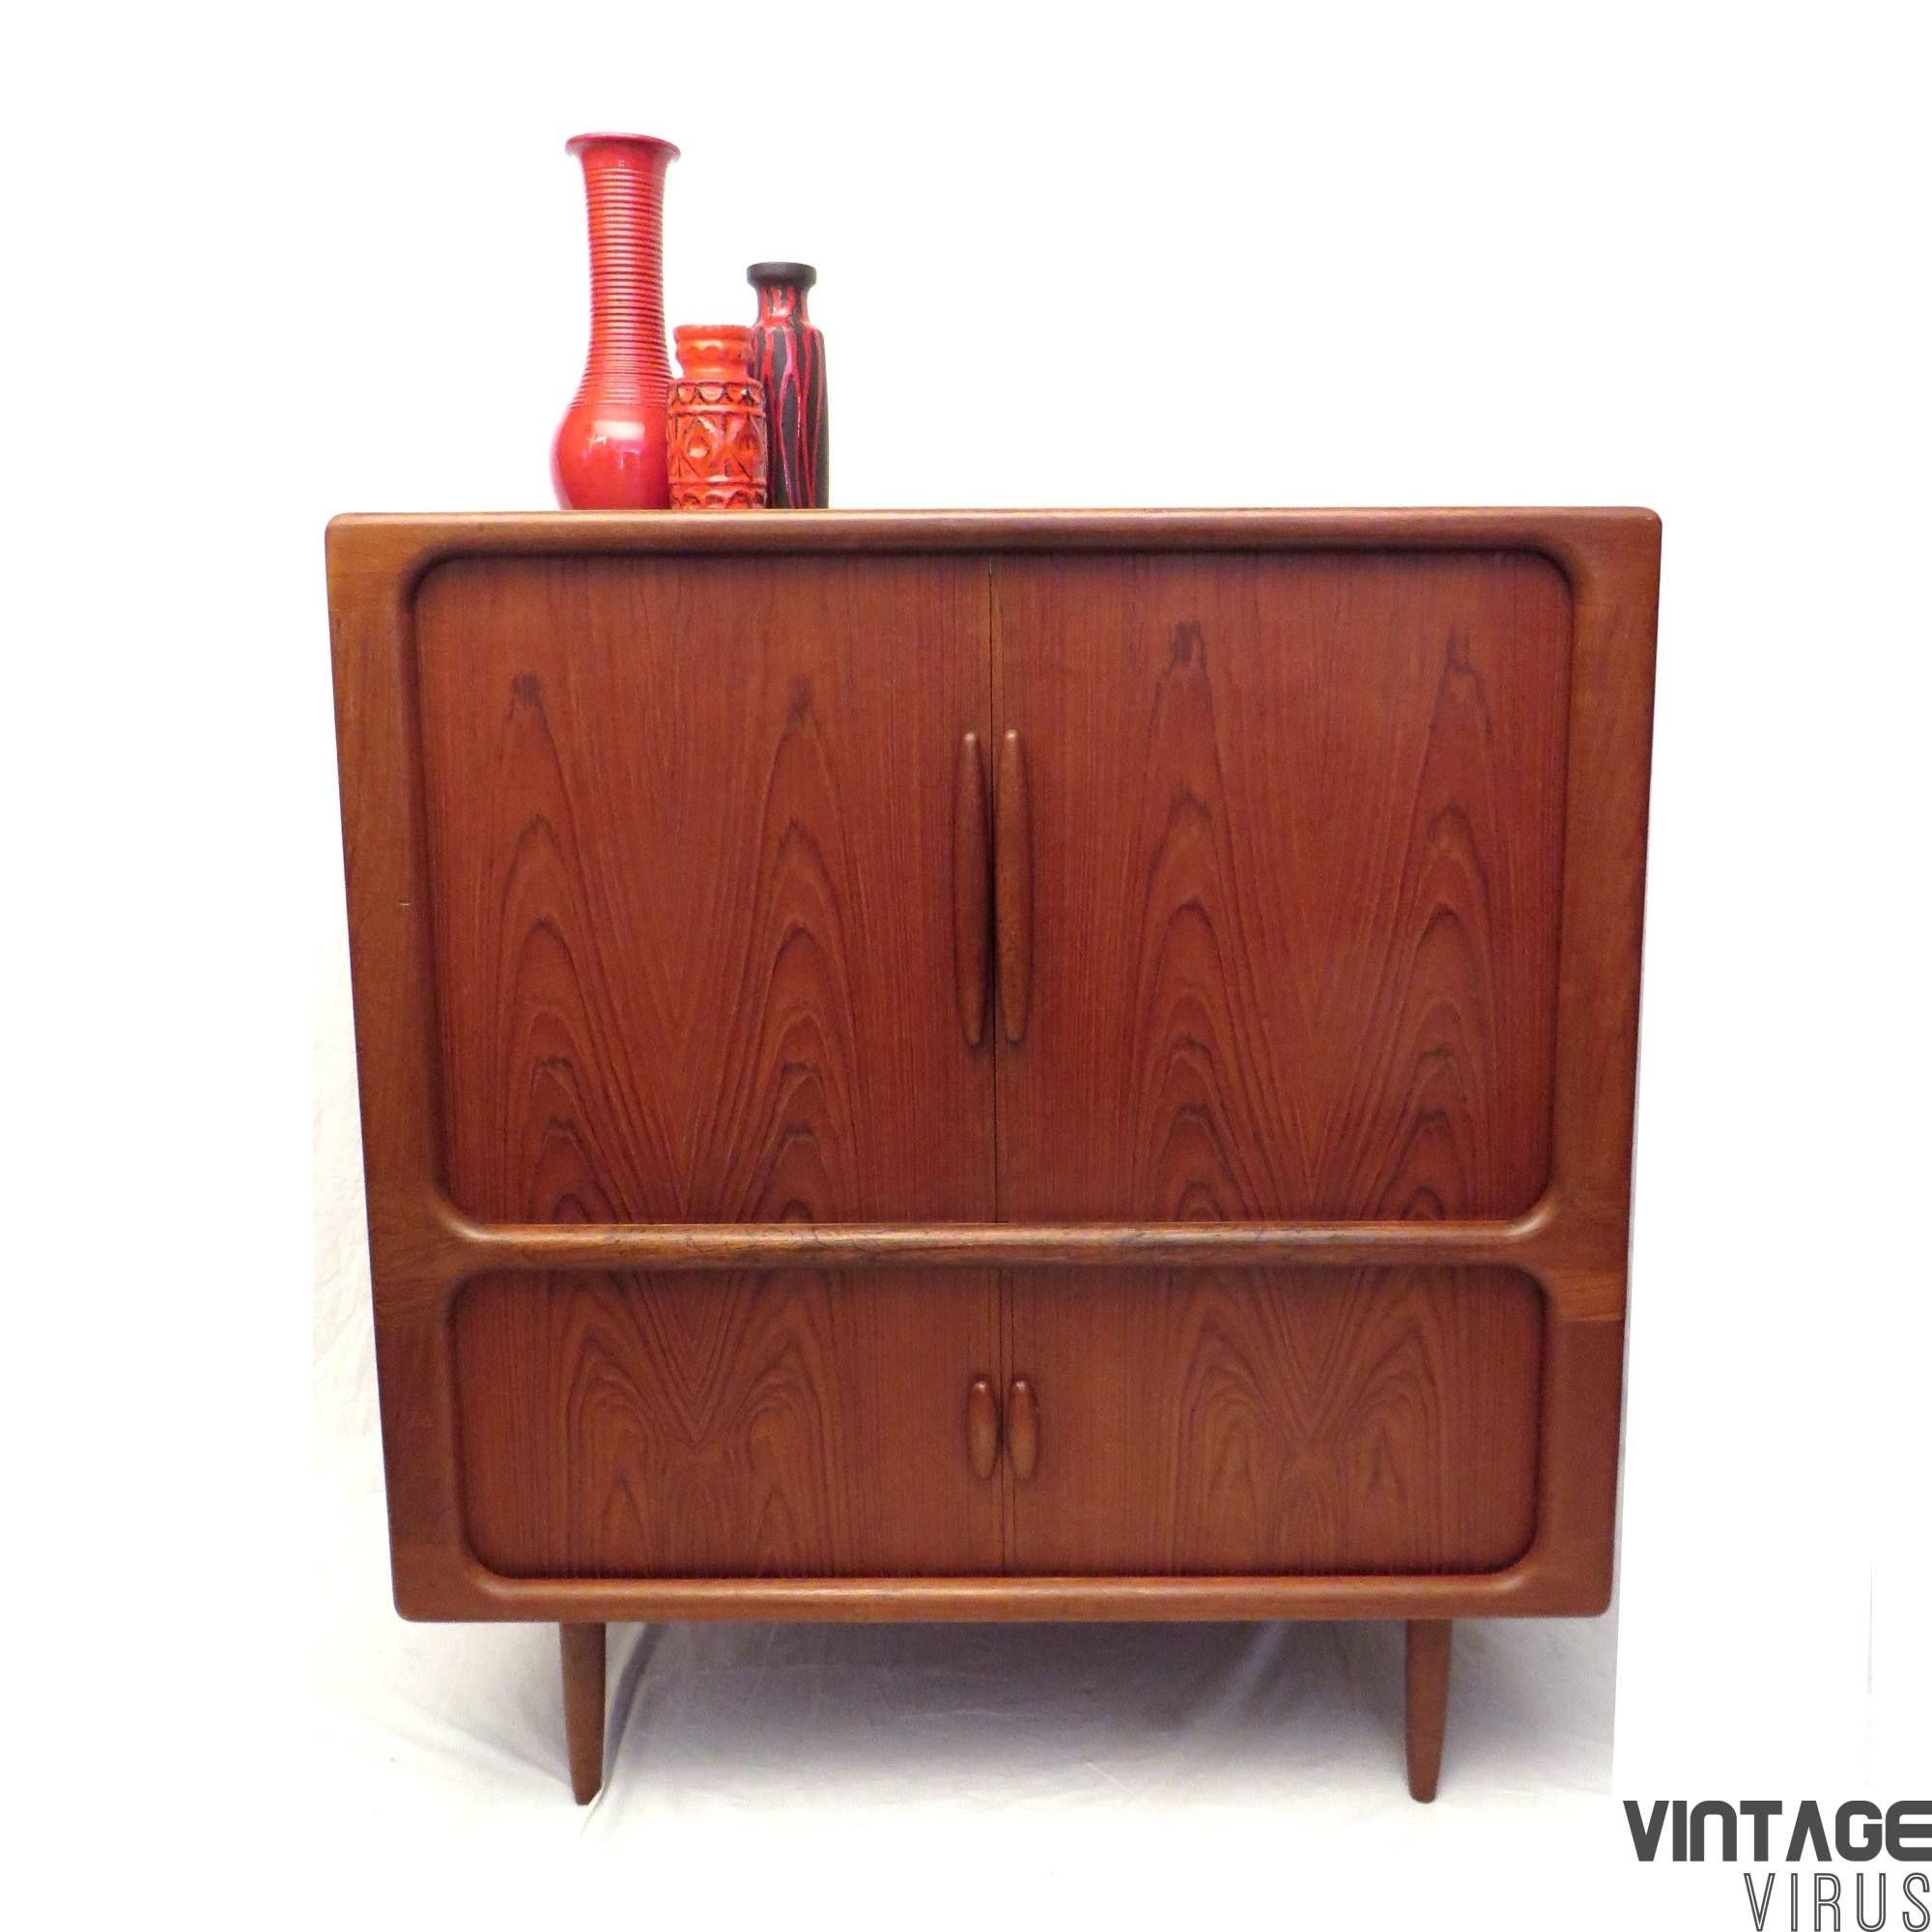 Grote Vintage Deens Design Dressoirkast Televisiemeubel